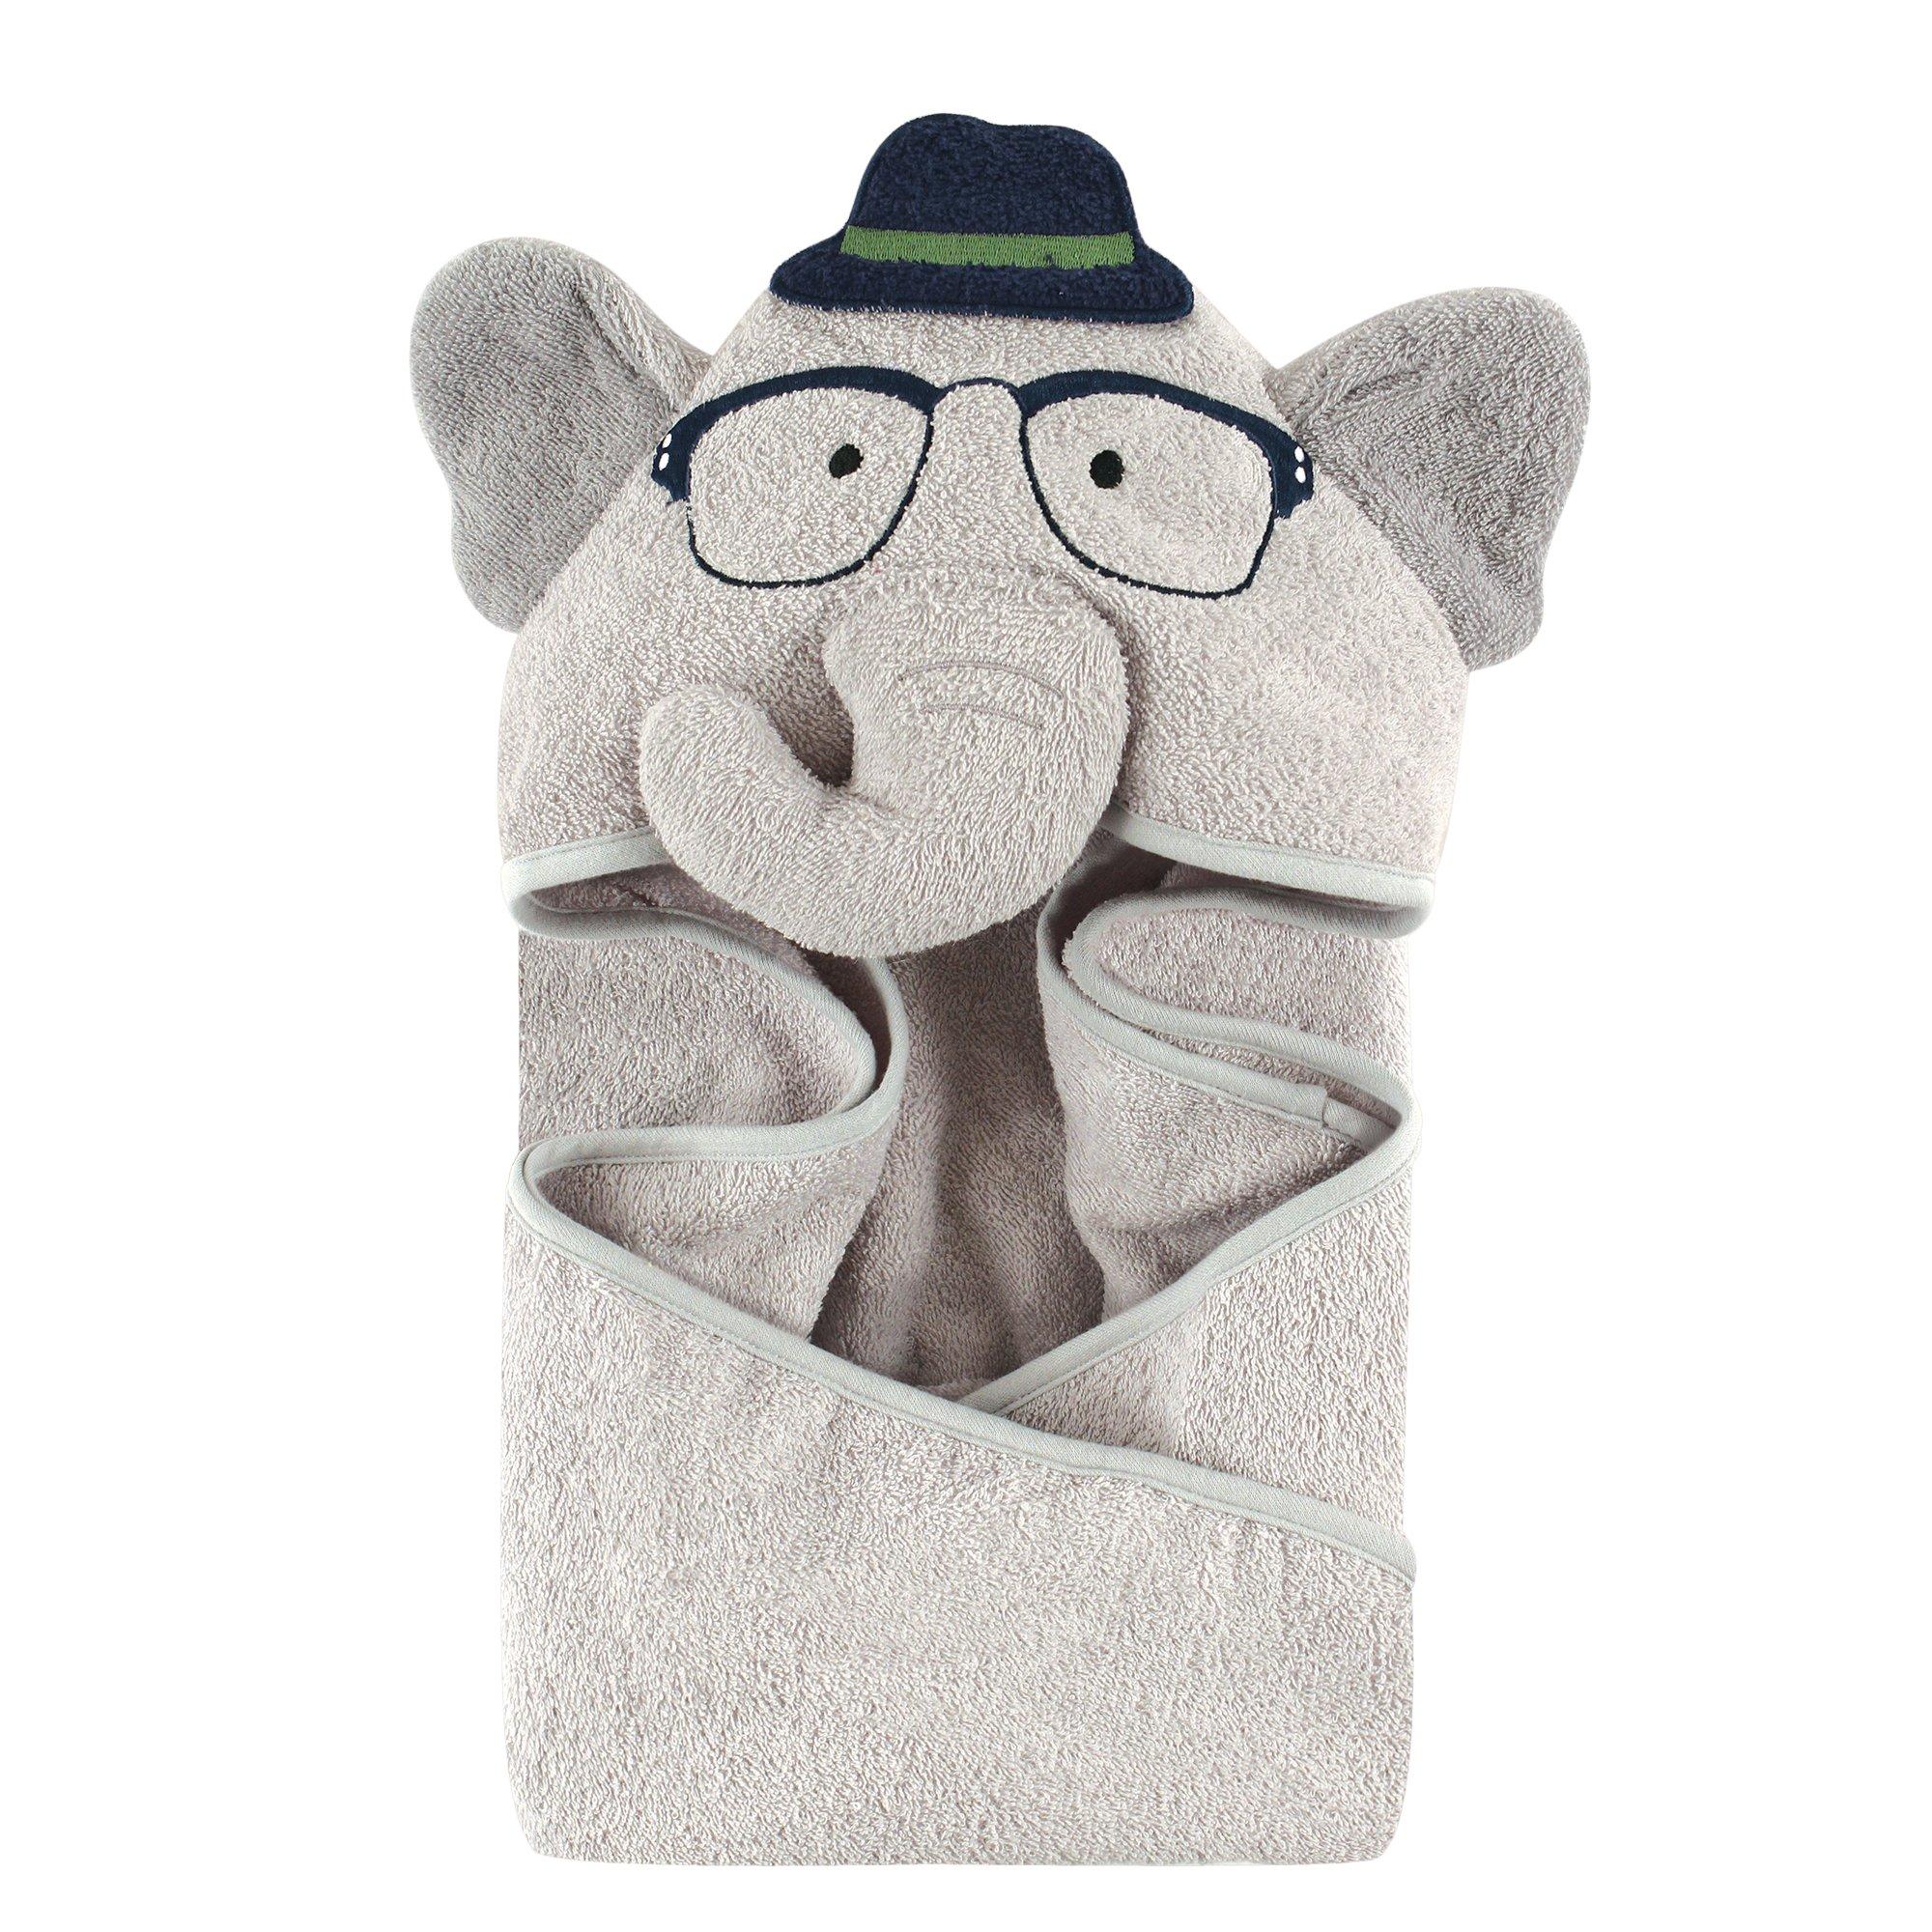 Hudson Baby Animal Face Hooded Towel for Boys, Smart Elephant